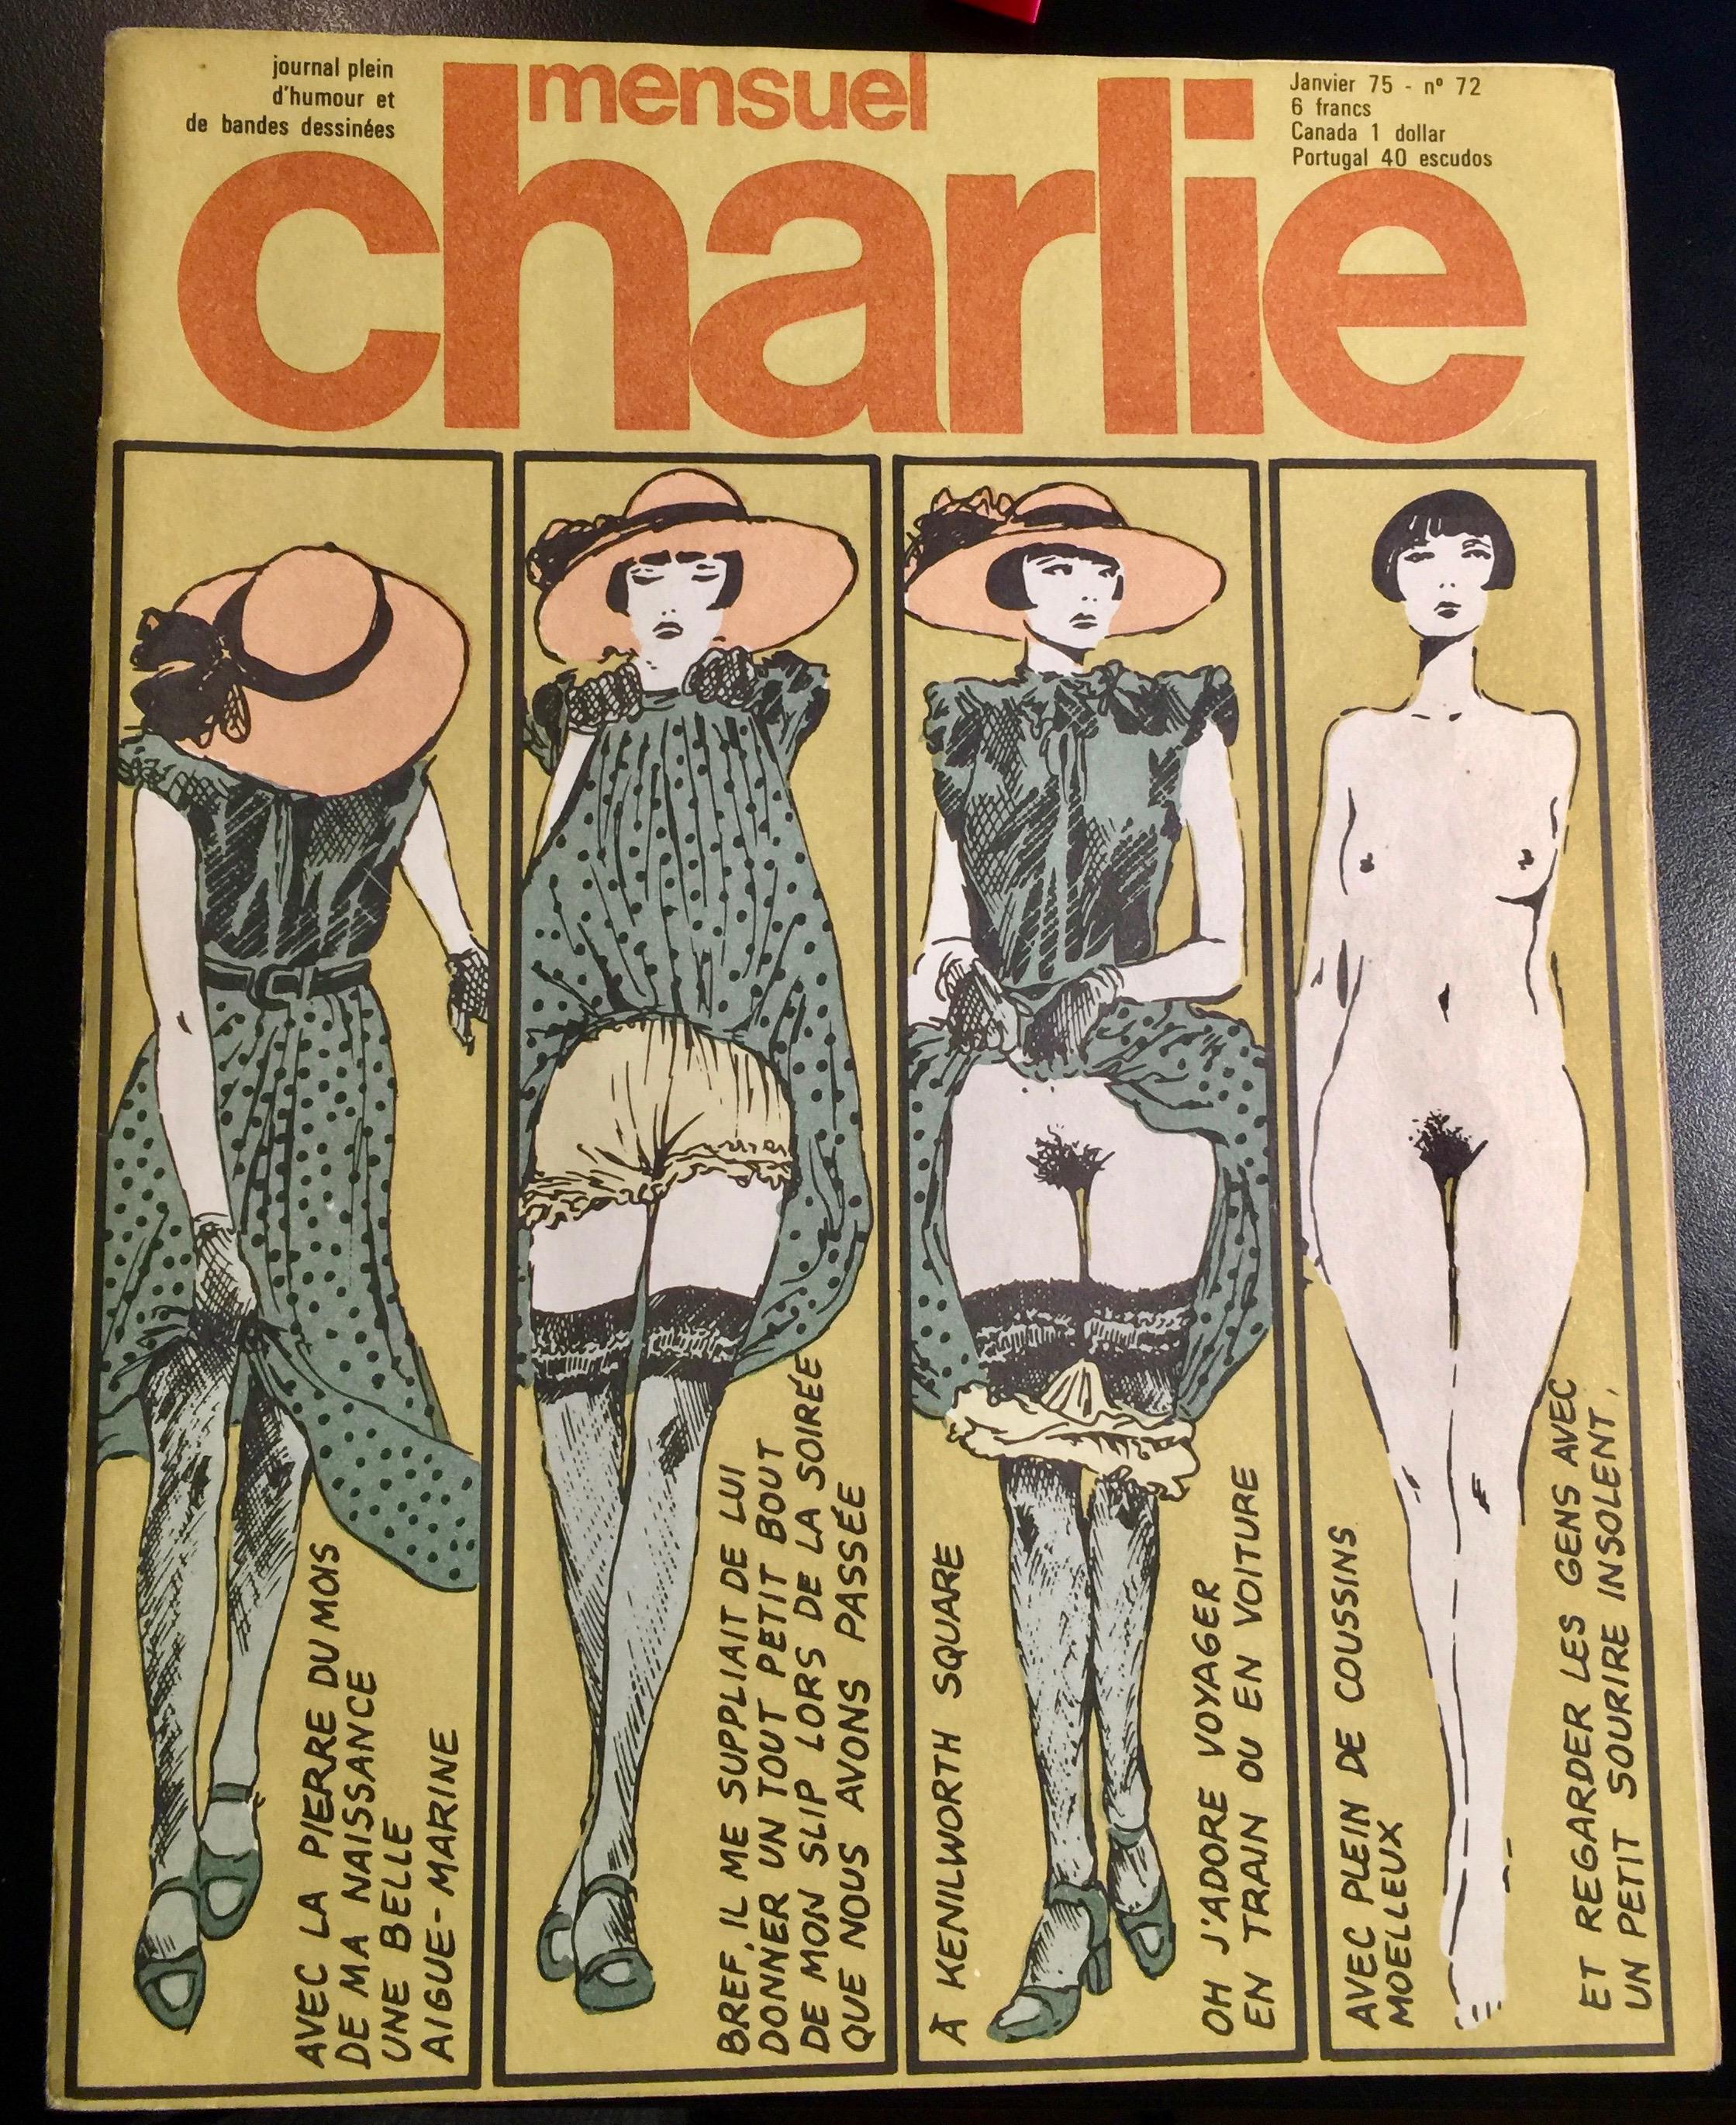 Charlie magasine satyrique